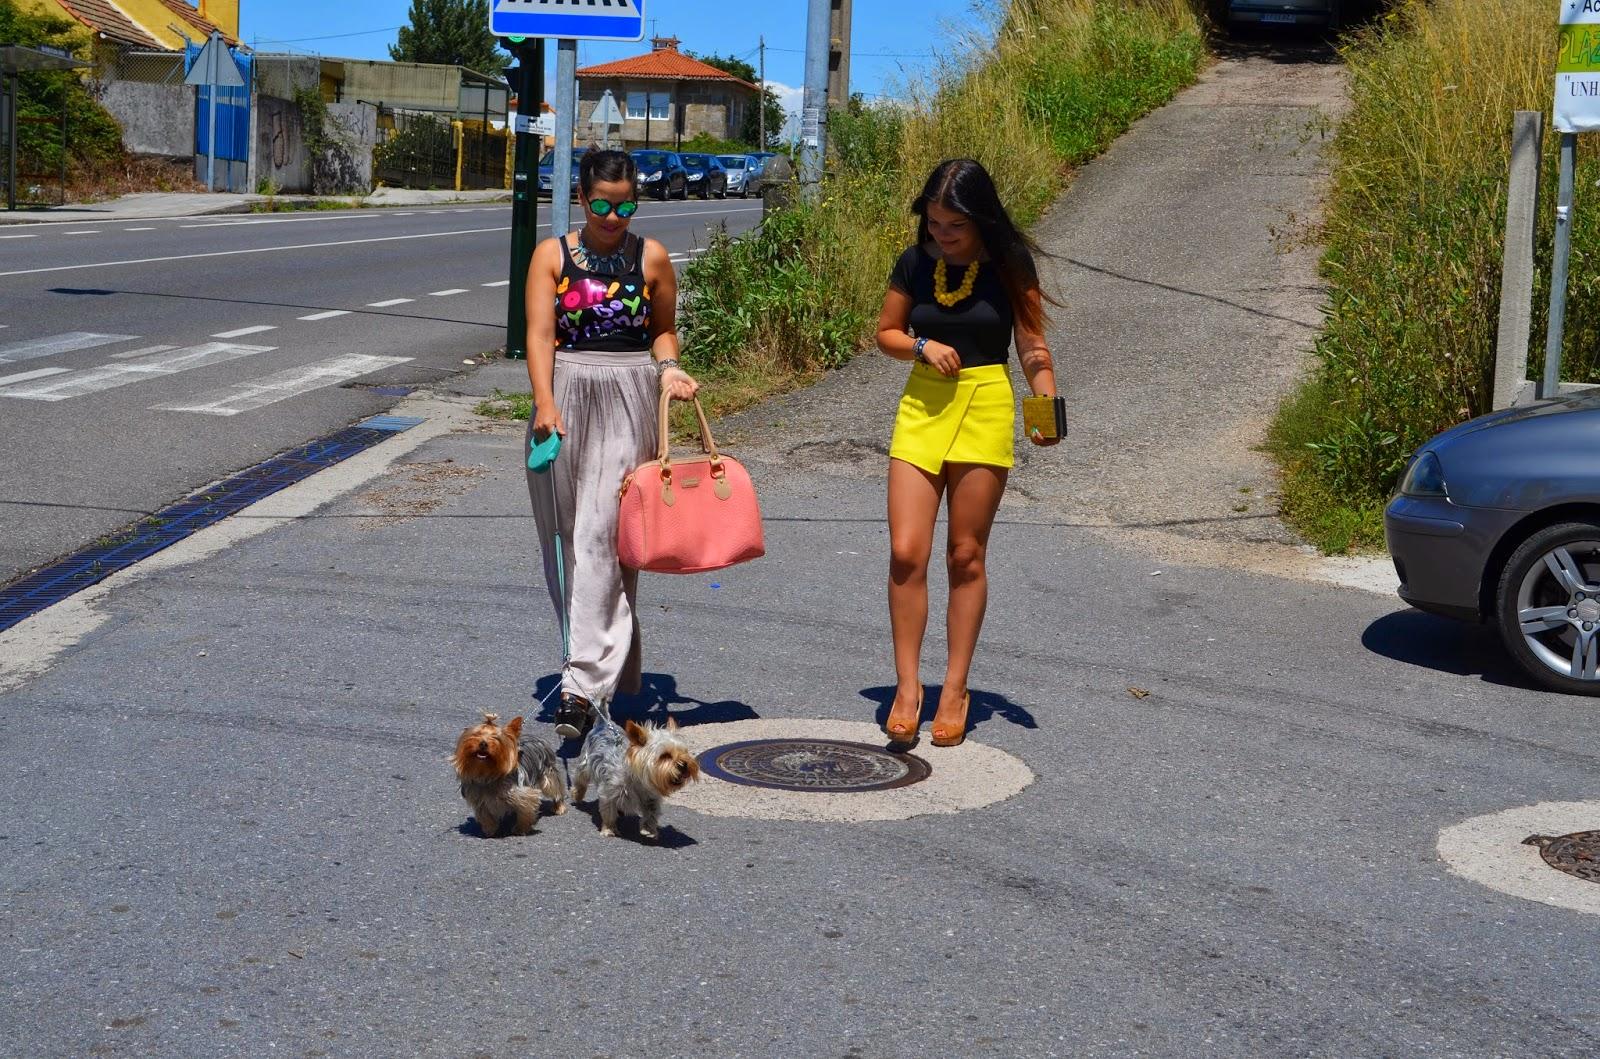 http://amigasyresidentesenstylestation.blogspot.com.es/2014/07/leo-y-duna.html